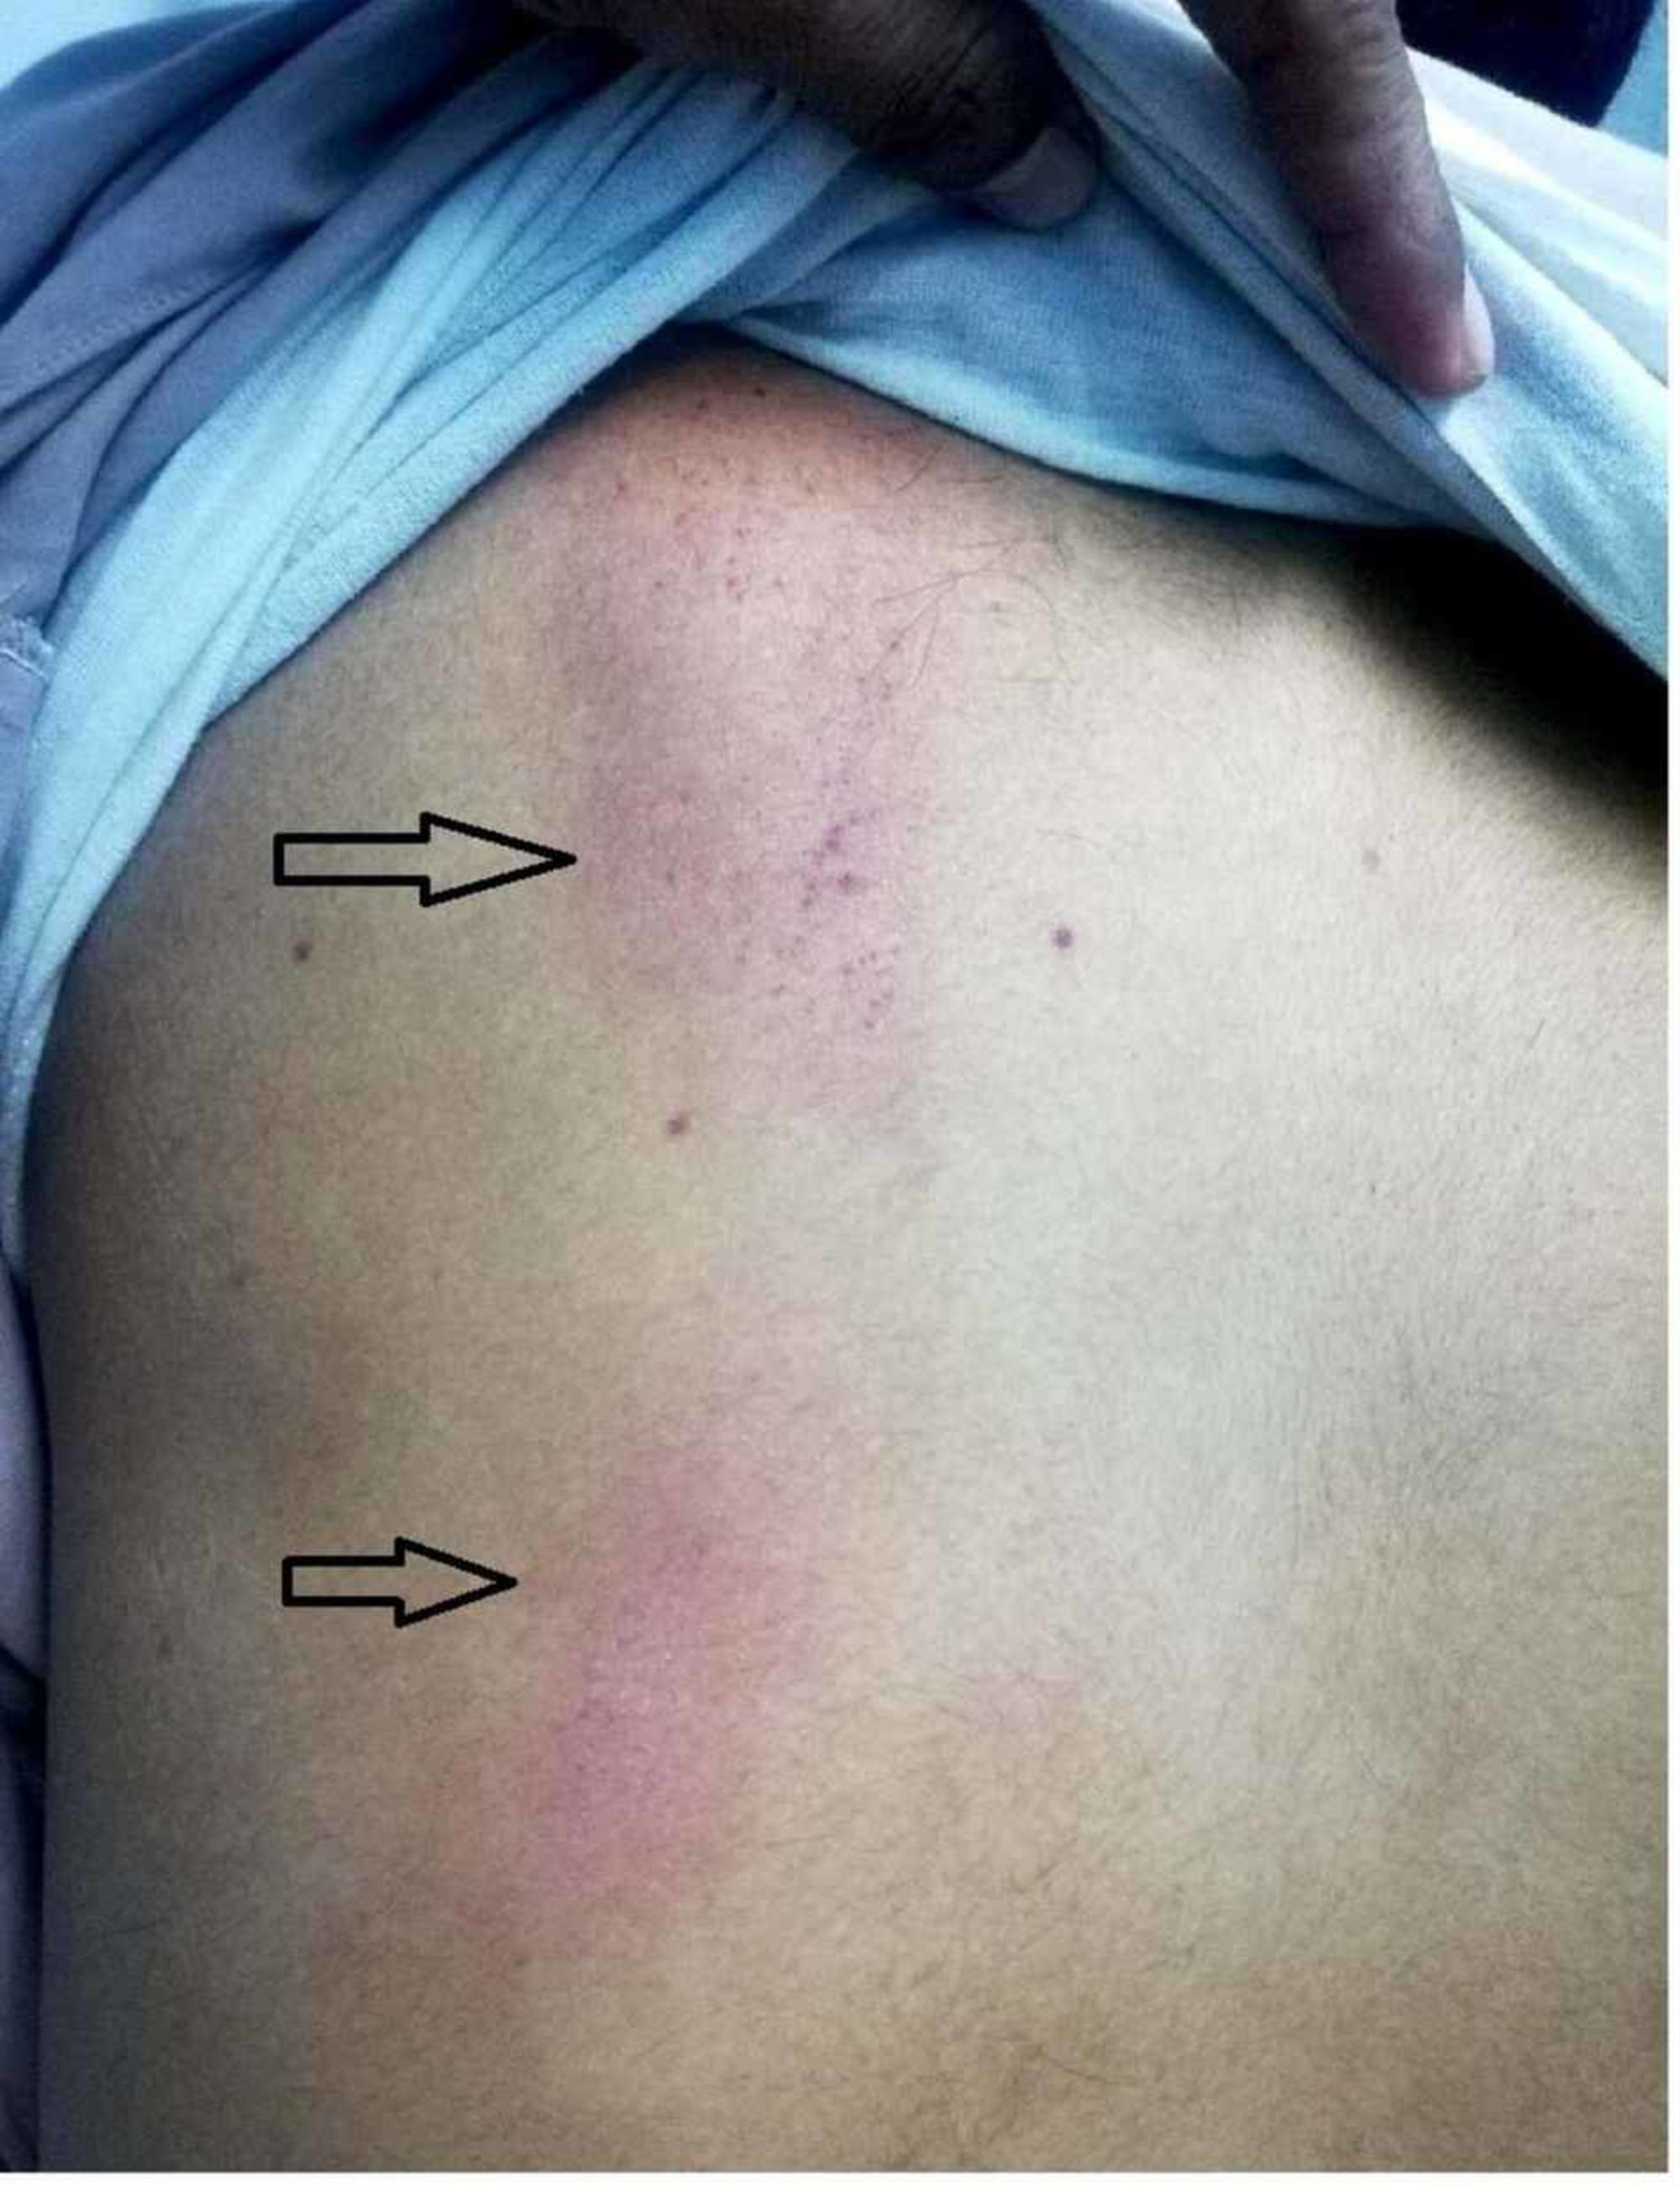 Cureus | A Case of Dengue Fever With Hemorrhagic Manifestations